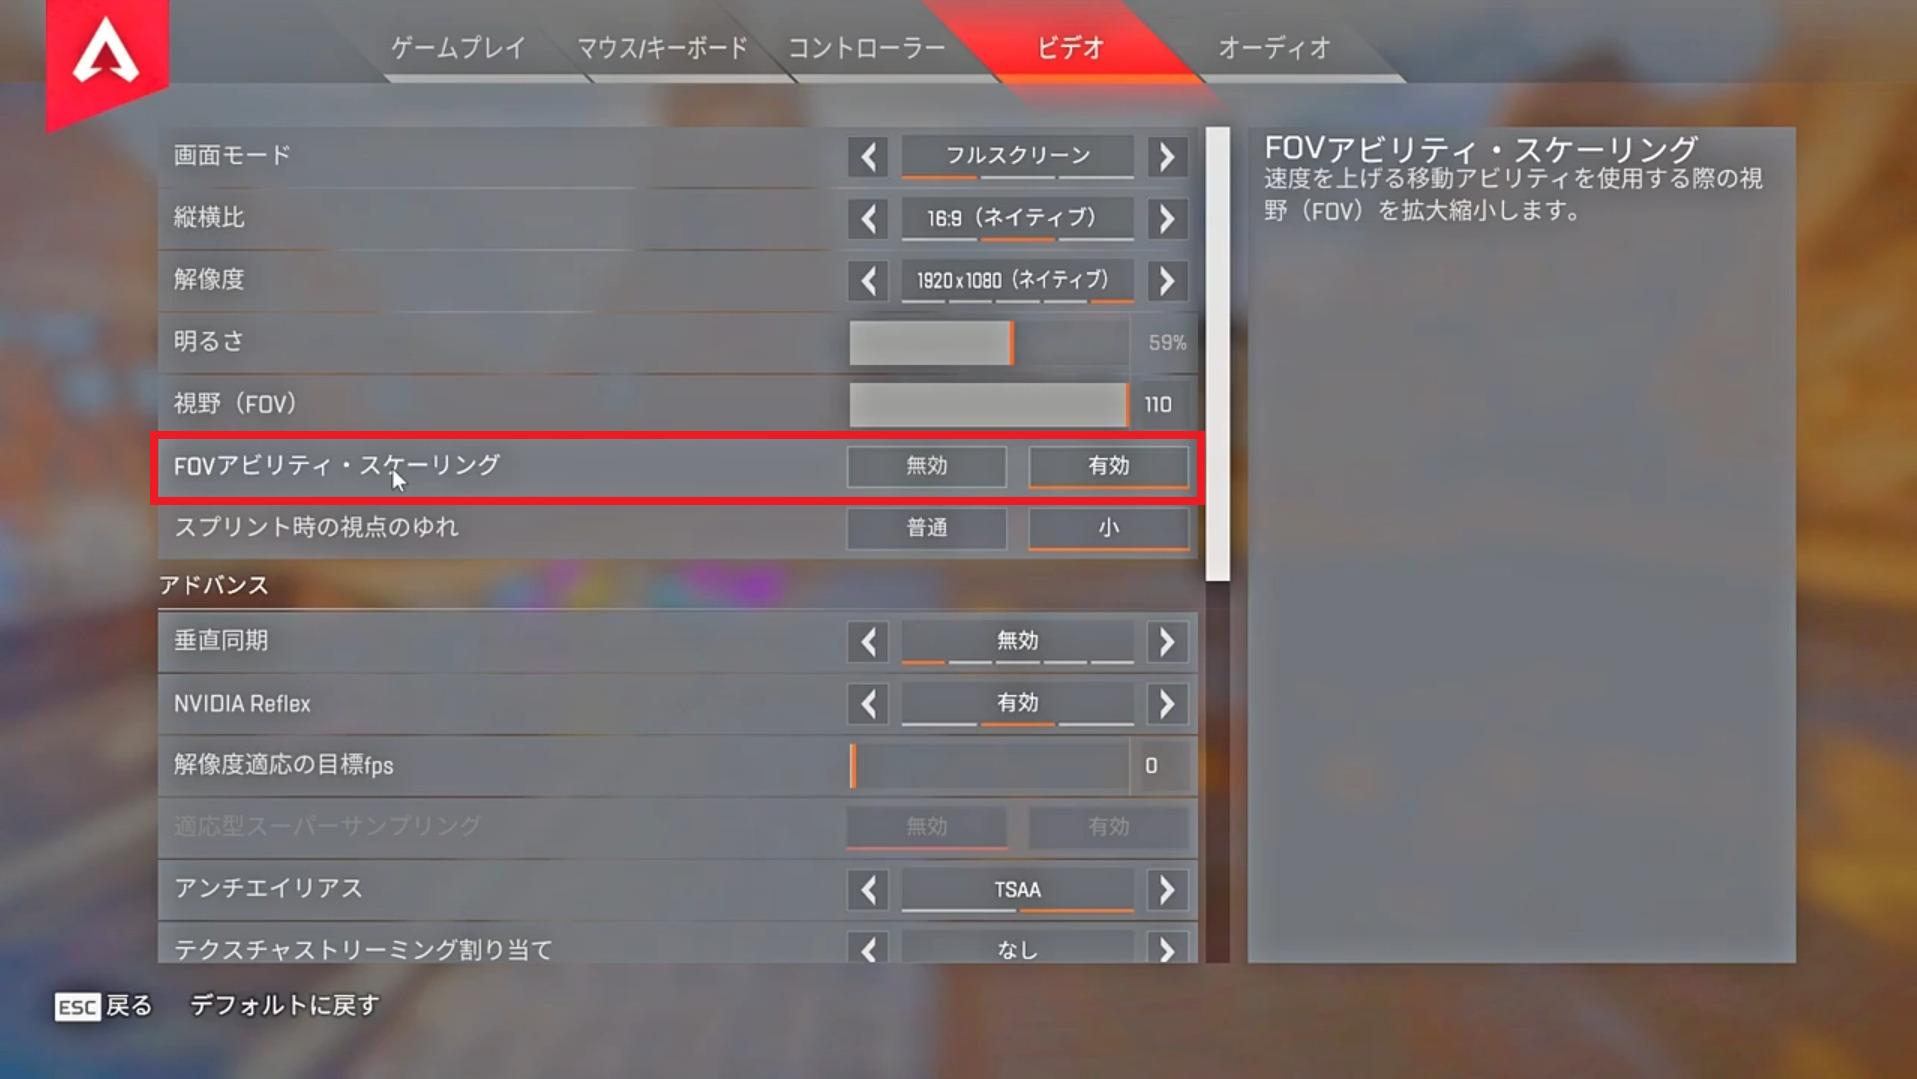 【Apex Legends】FOVアビリティ・スケーリングとは?視野角を固定する設定方法【エーペックスレジェンズ】